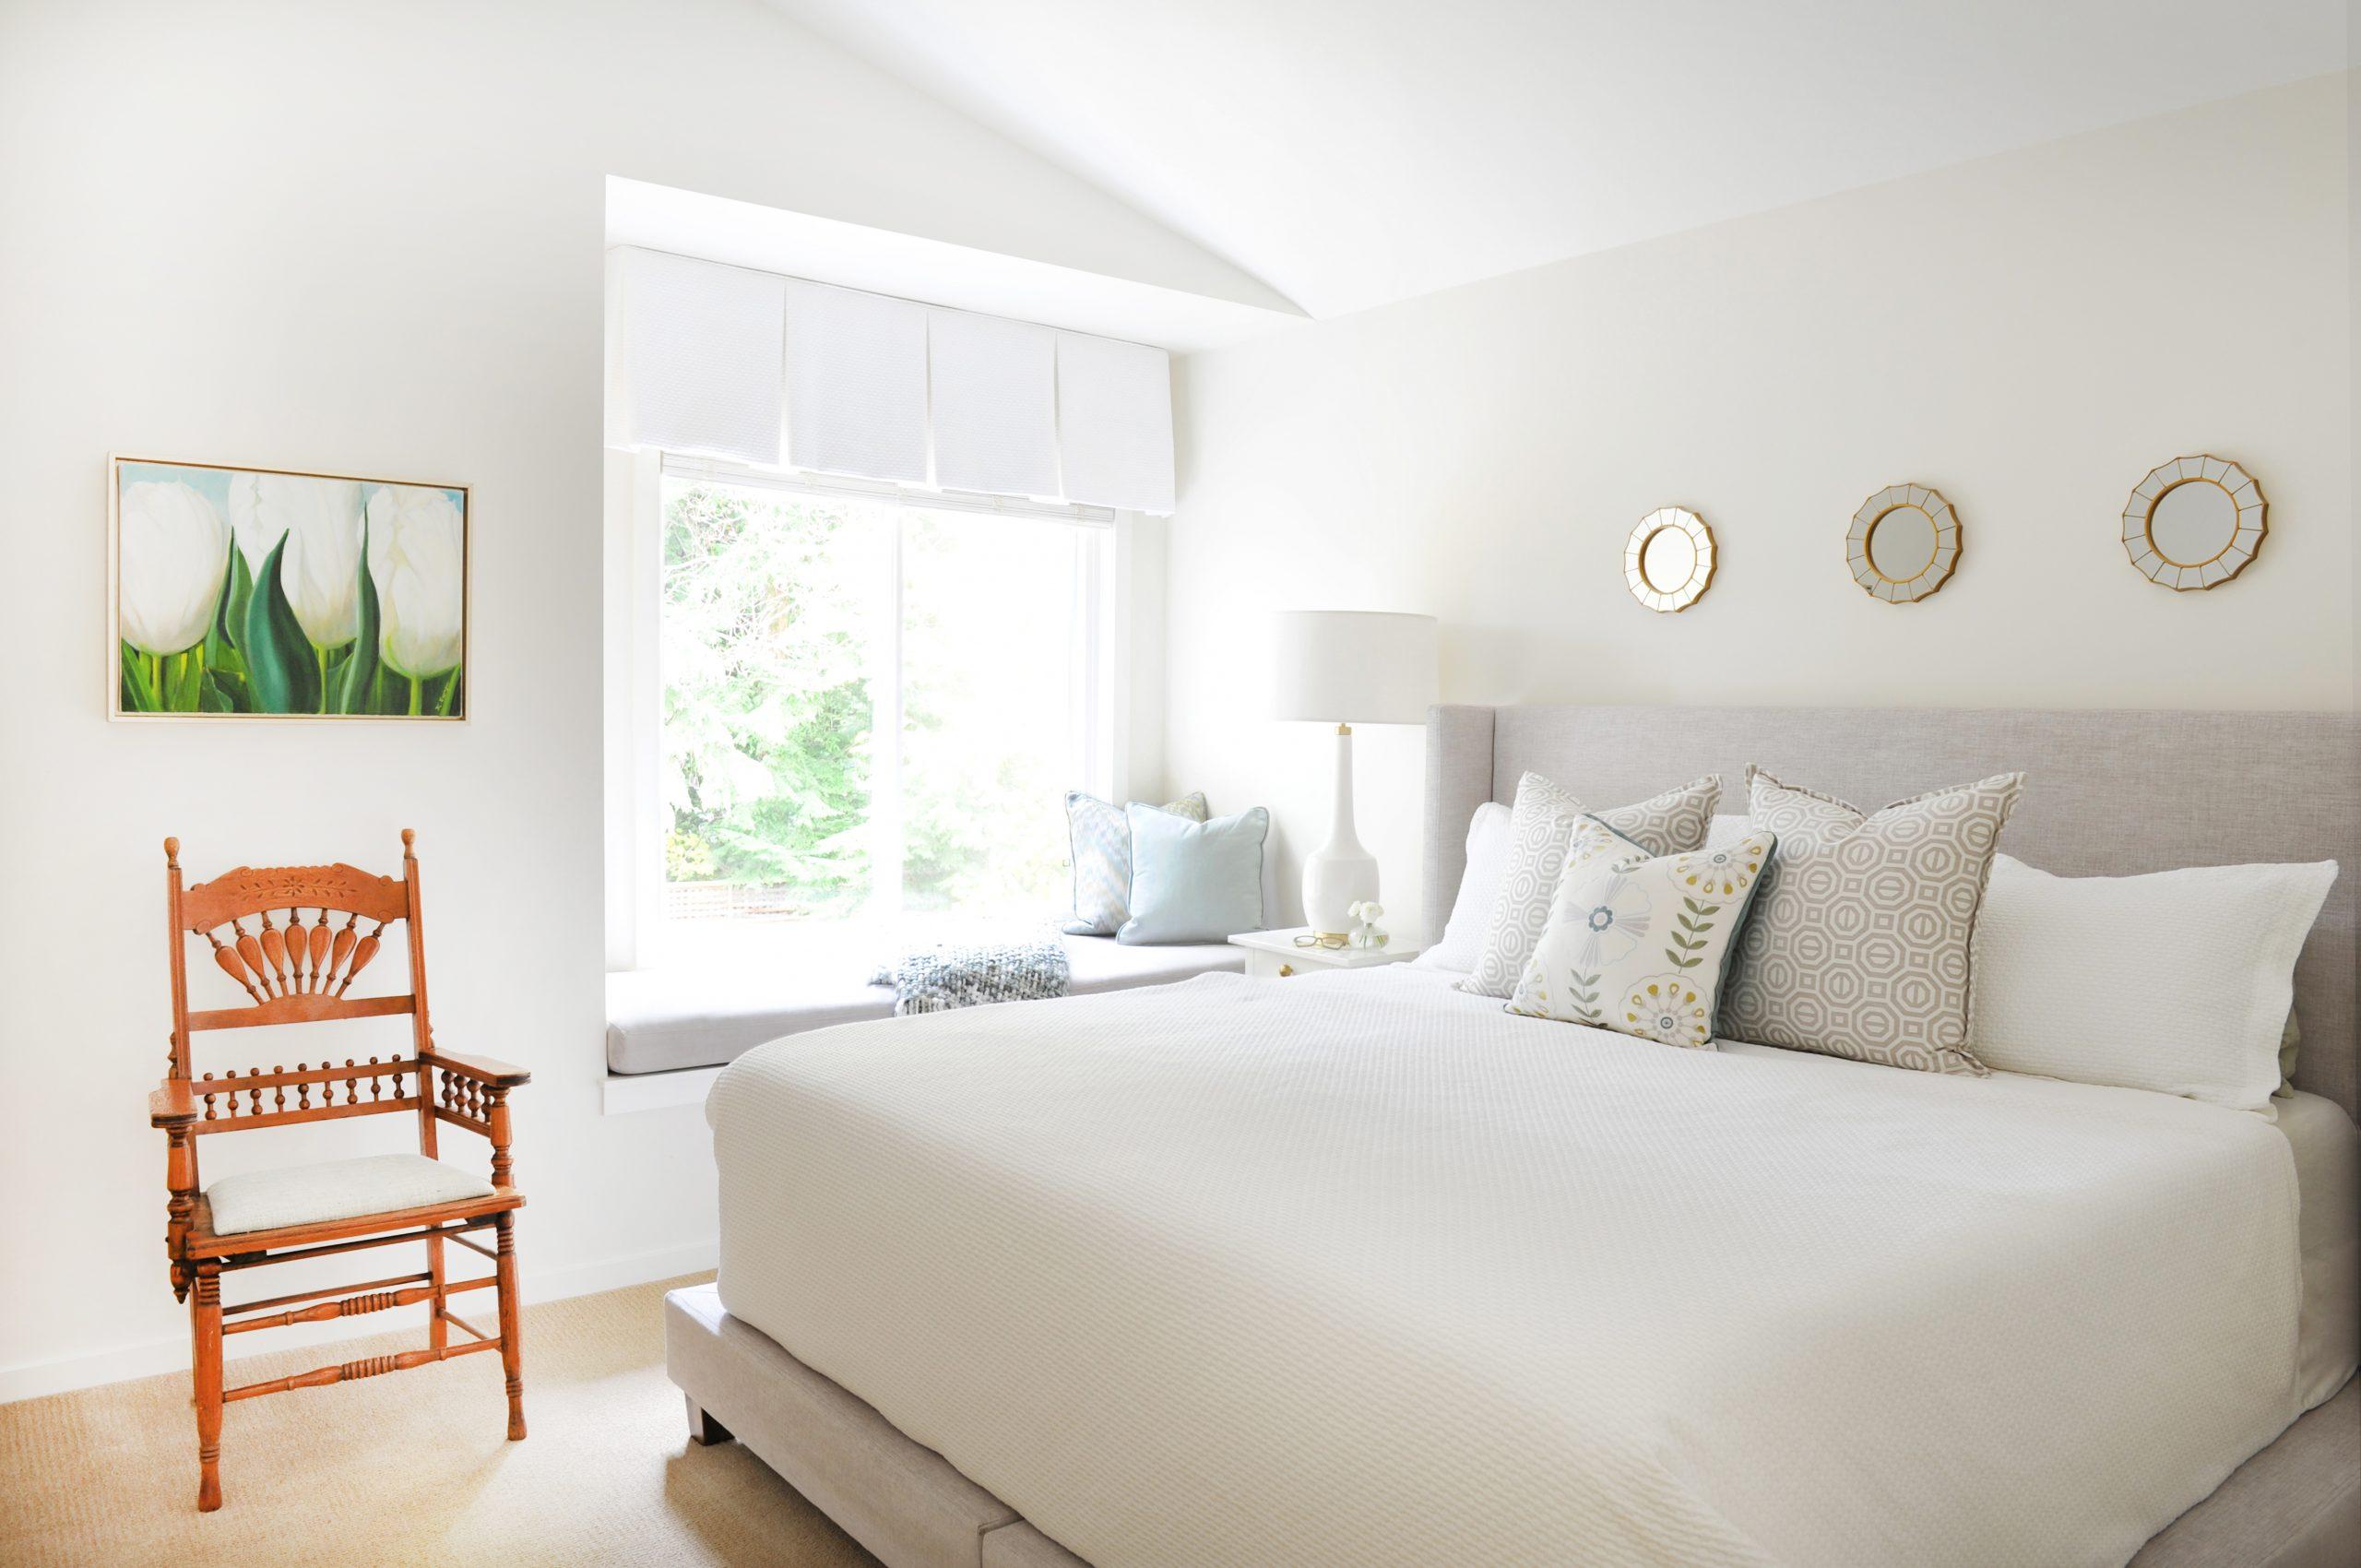 white cream bedroom wood chair green artwork interior design